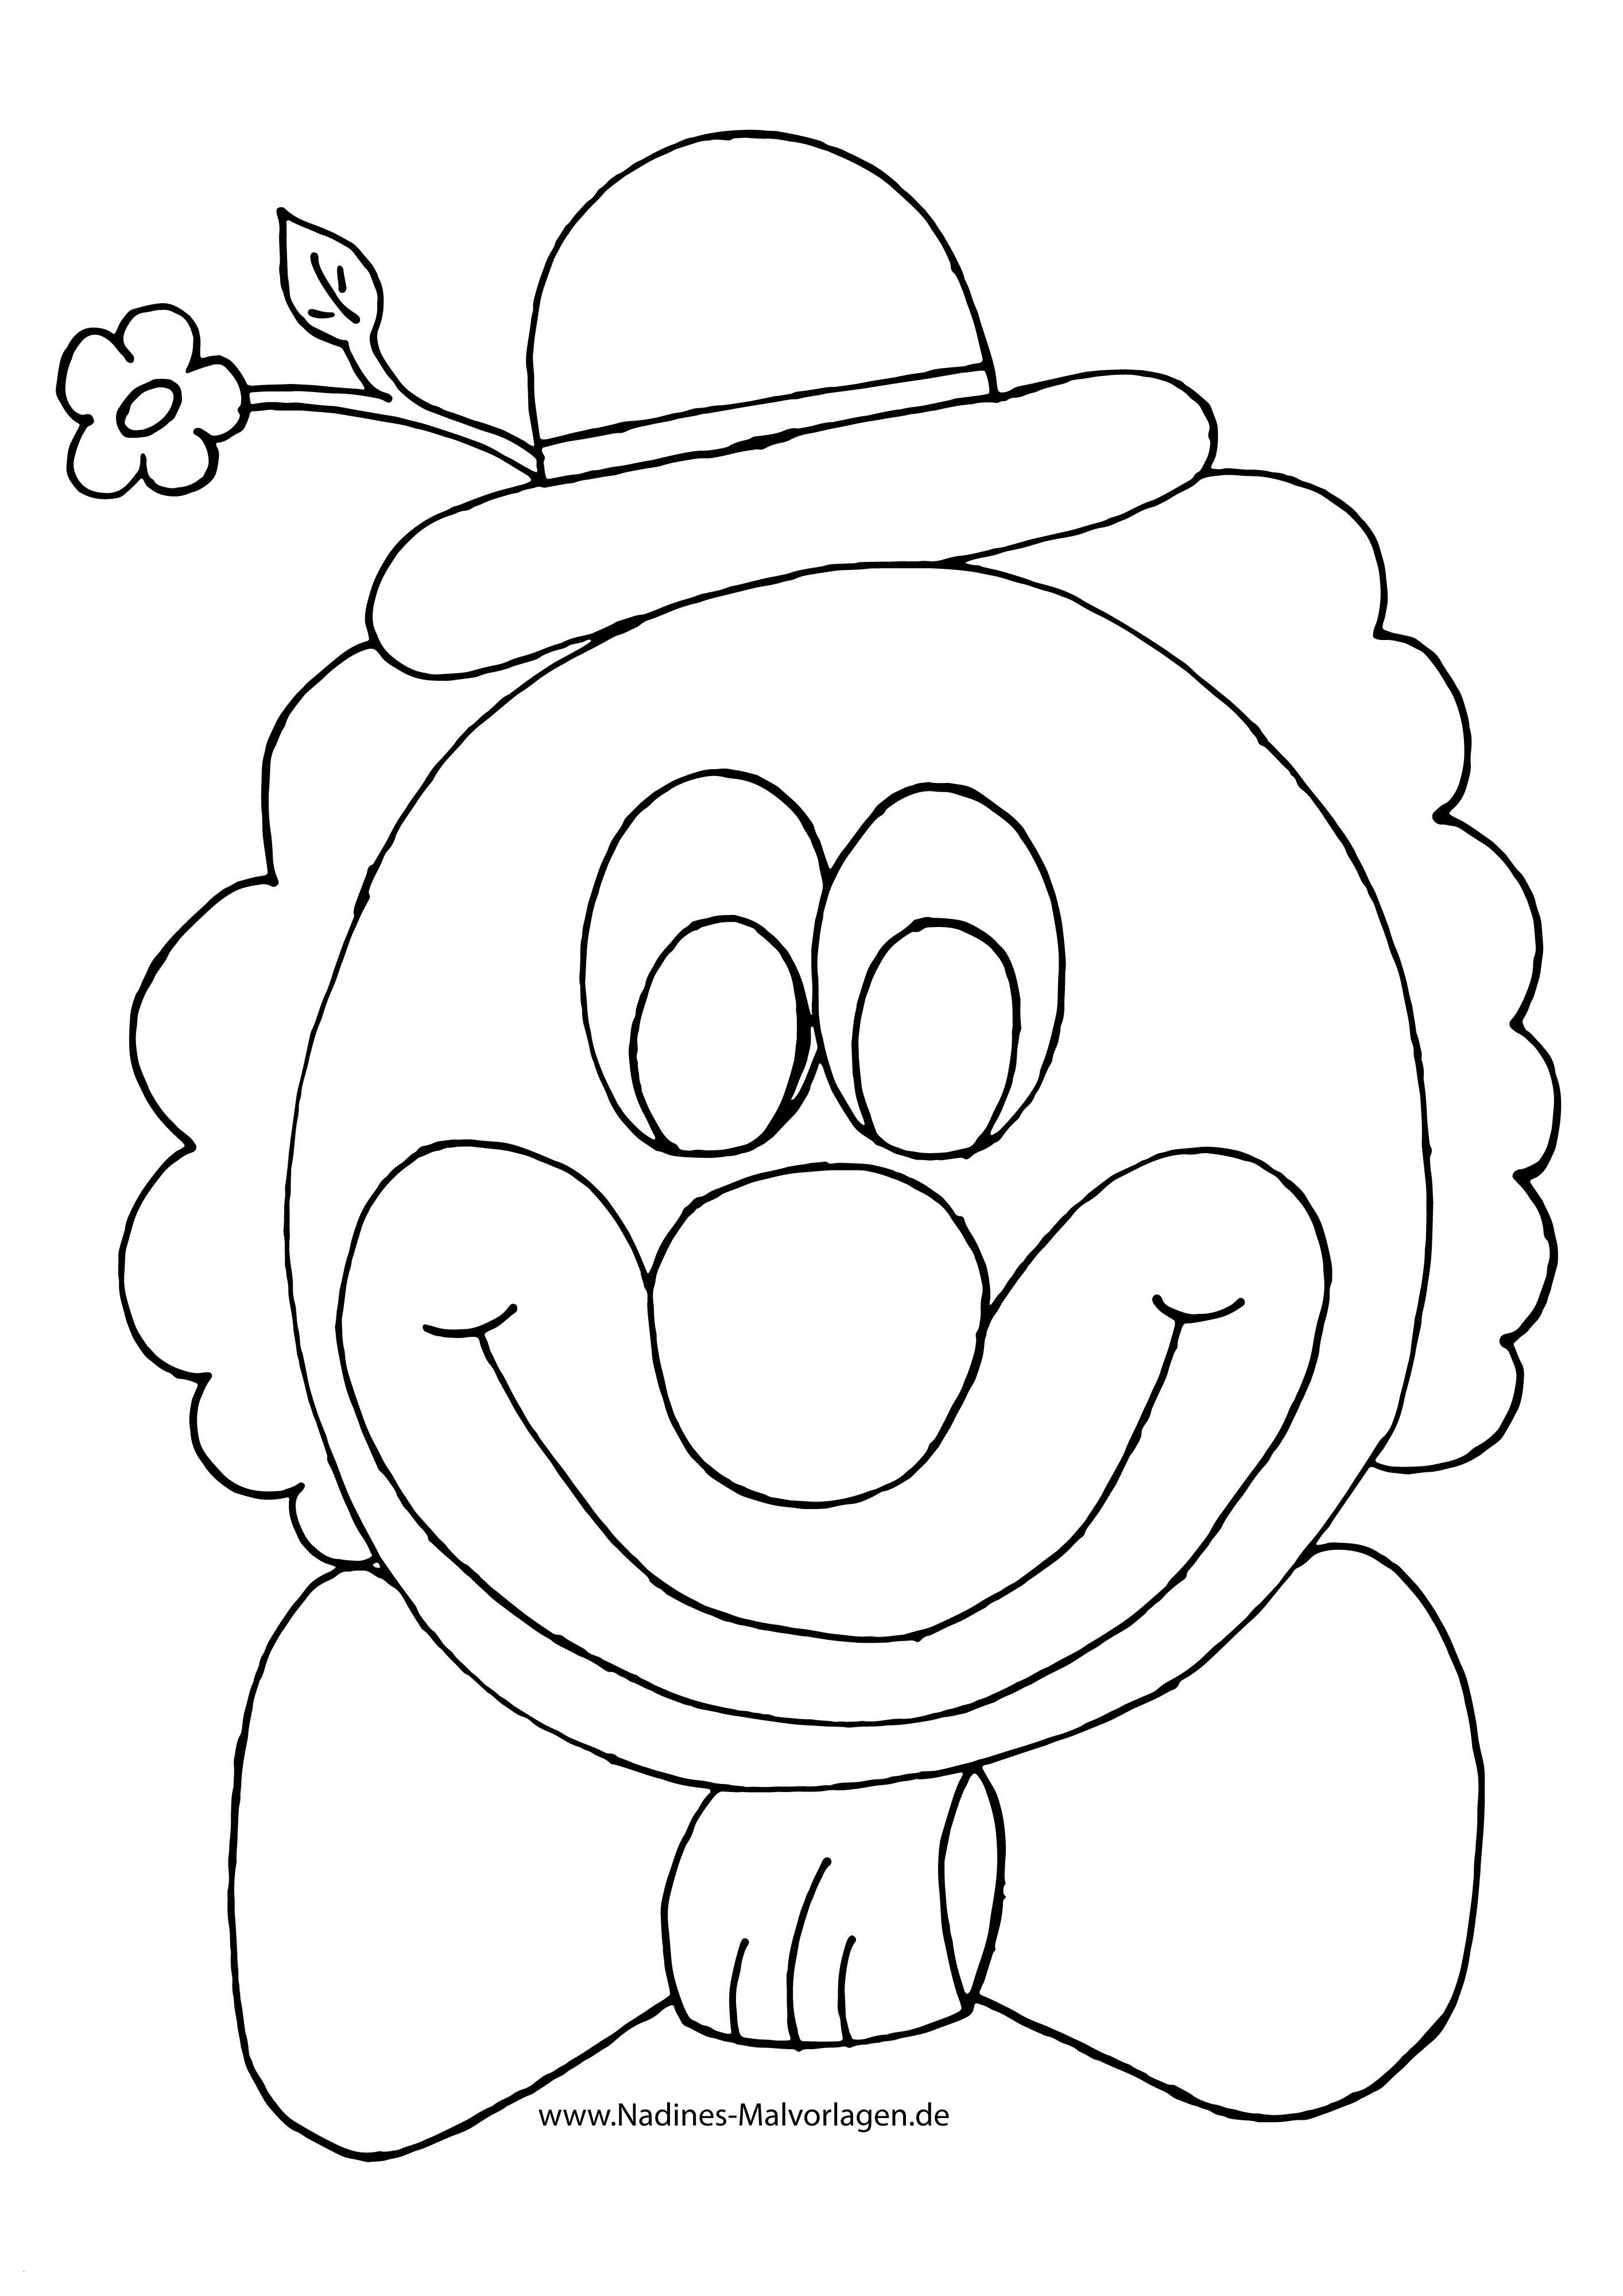 Minions Ausmalbilder Kostenlos Inspirierend 40 Clown Ausmalbilder Ausdrucken Scoredatscore Genial Minions Fotografieren